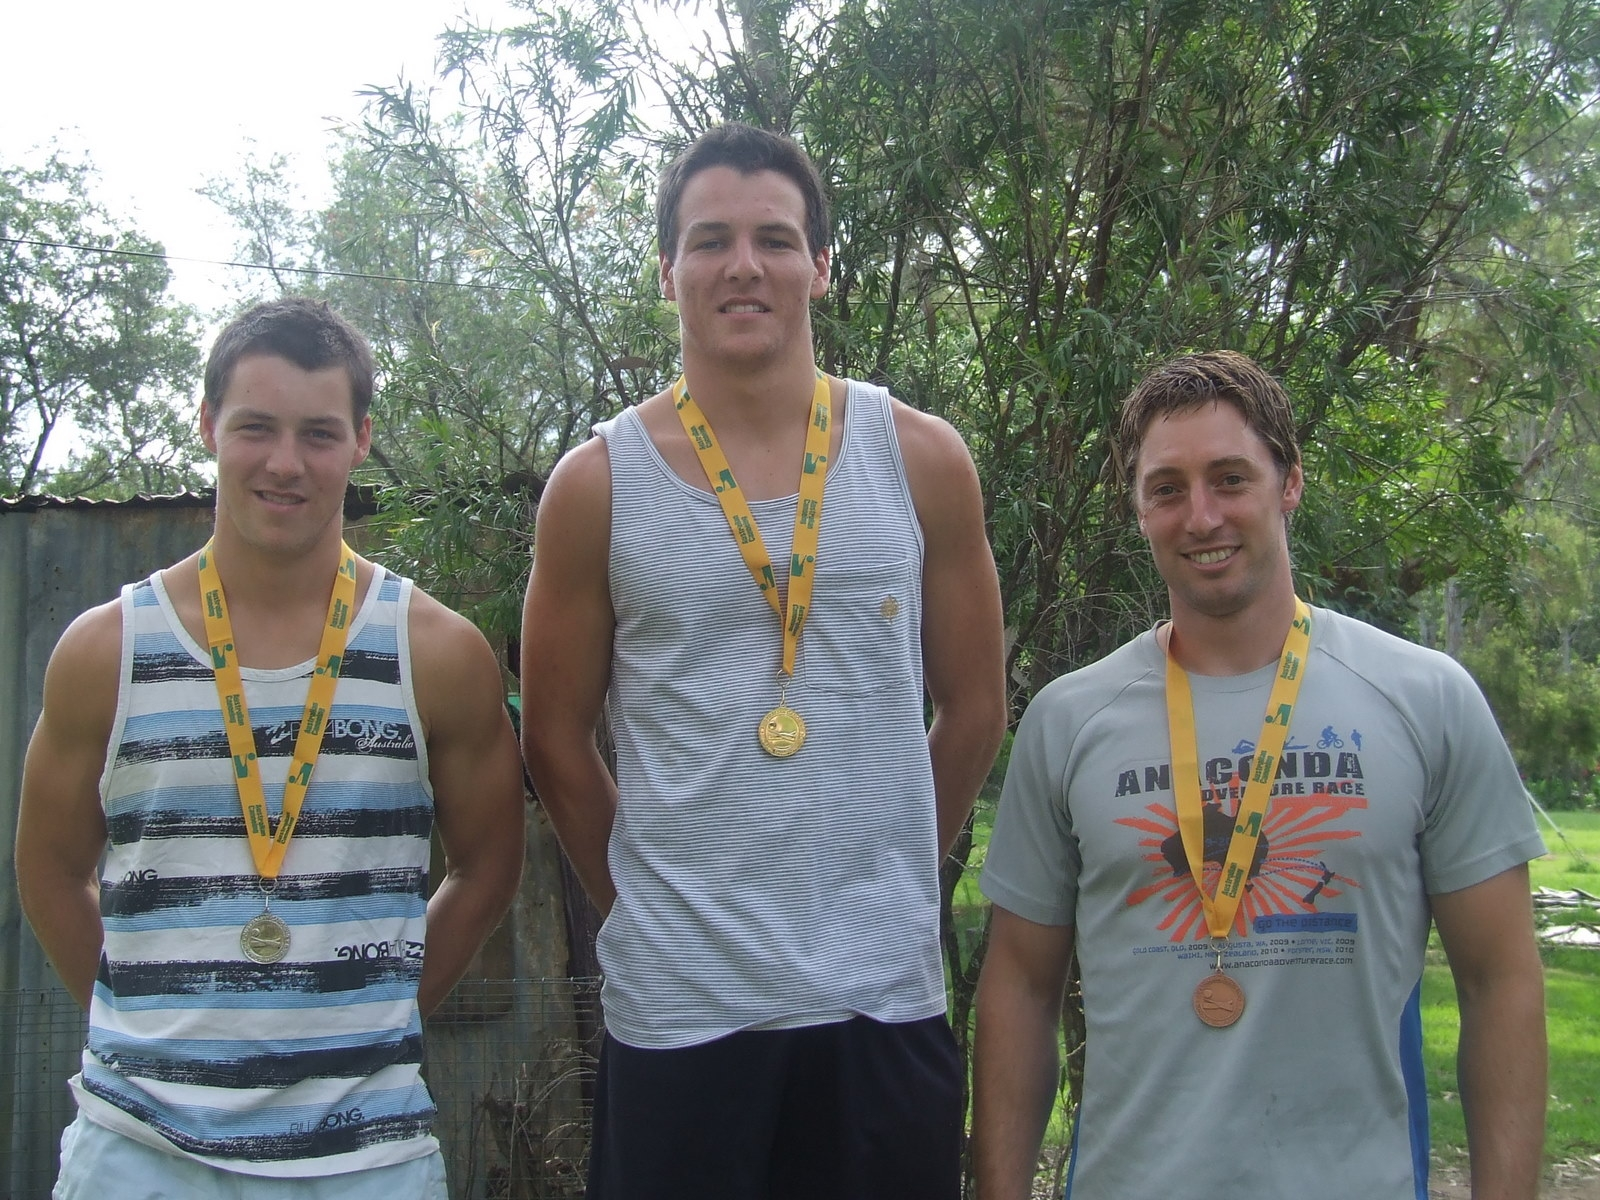 2011 Australian Down River Team Representatives from left to Right, Alex McIntyre, Robert McIntyre and Peter Lockett, all Prijon paddlers.